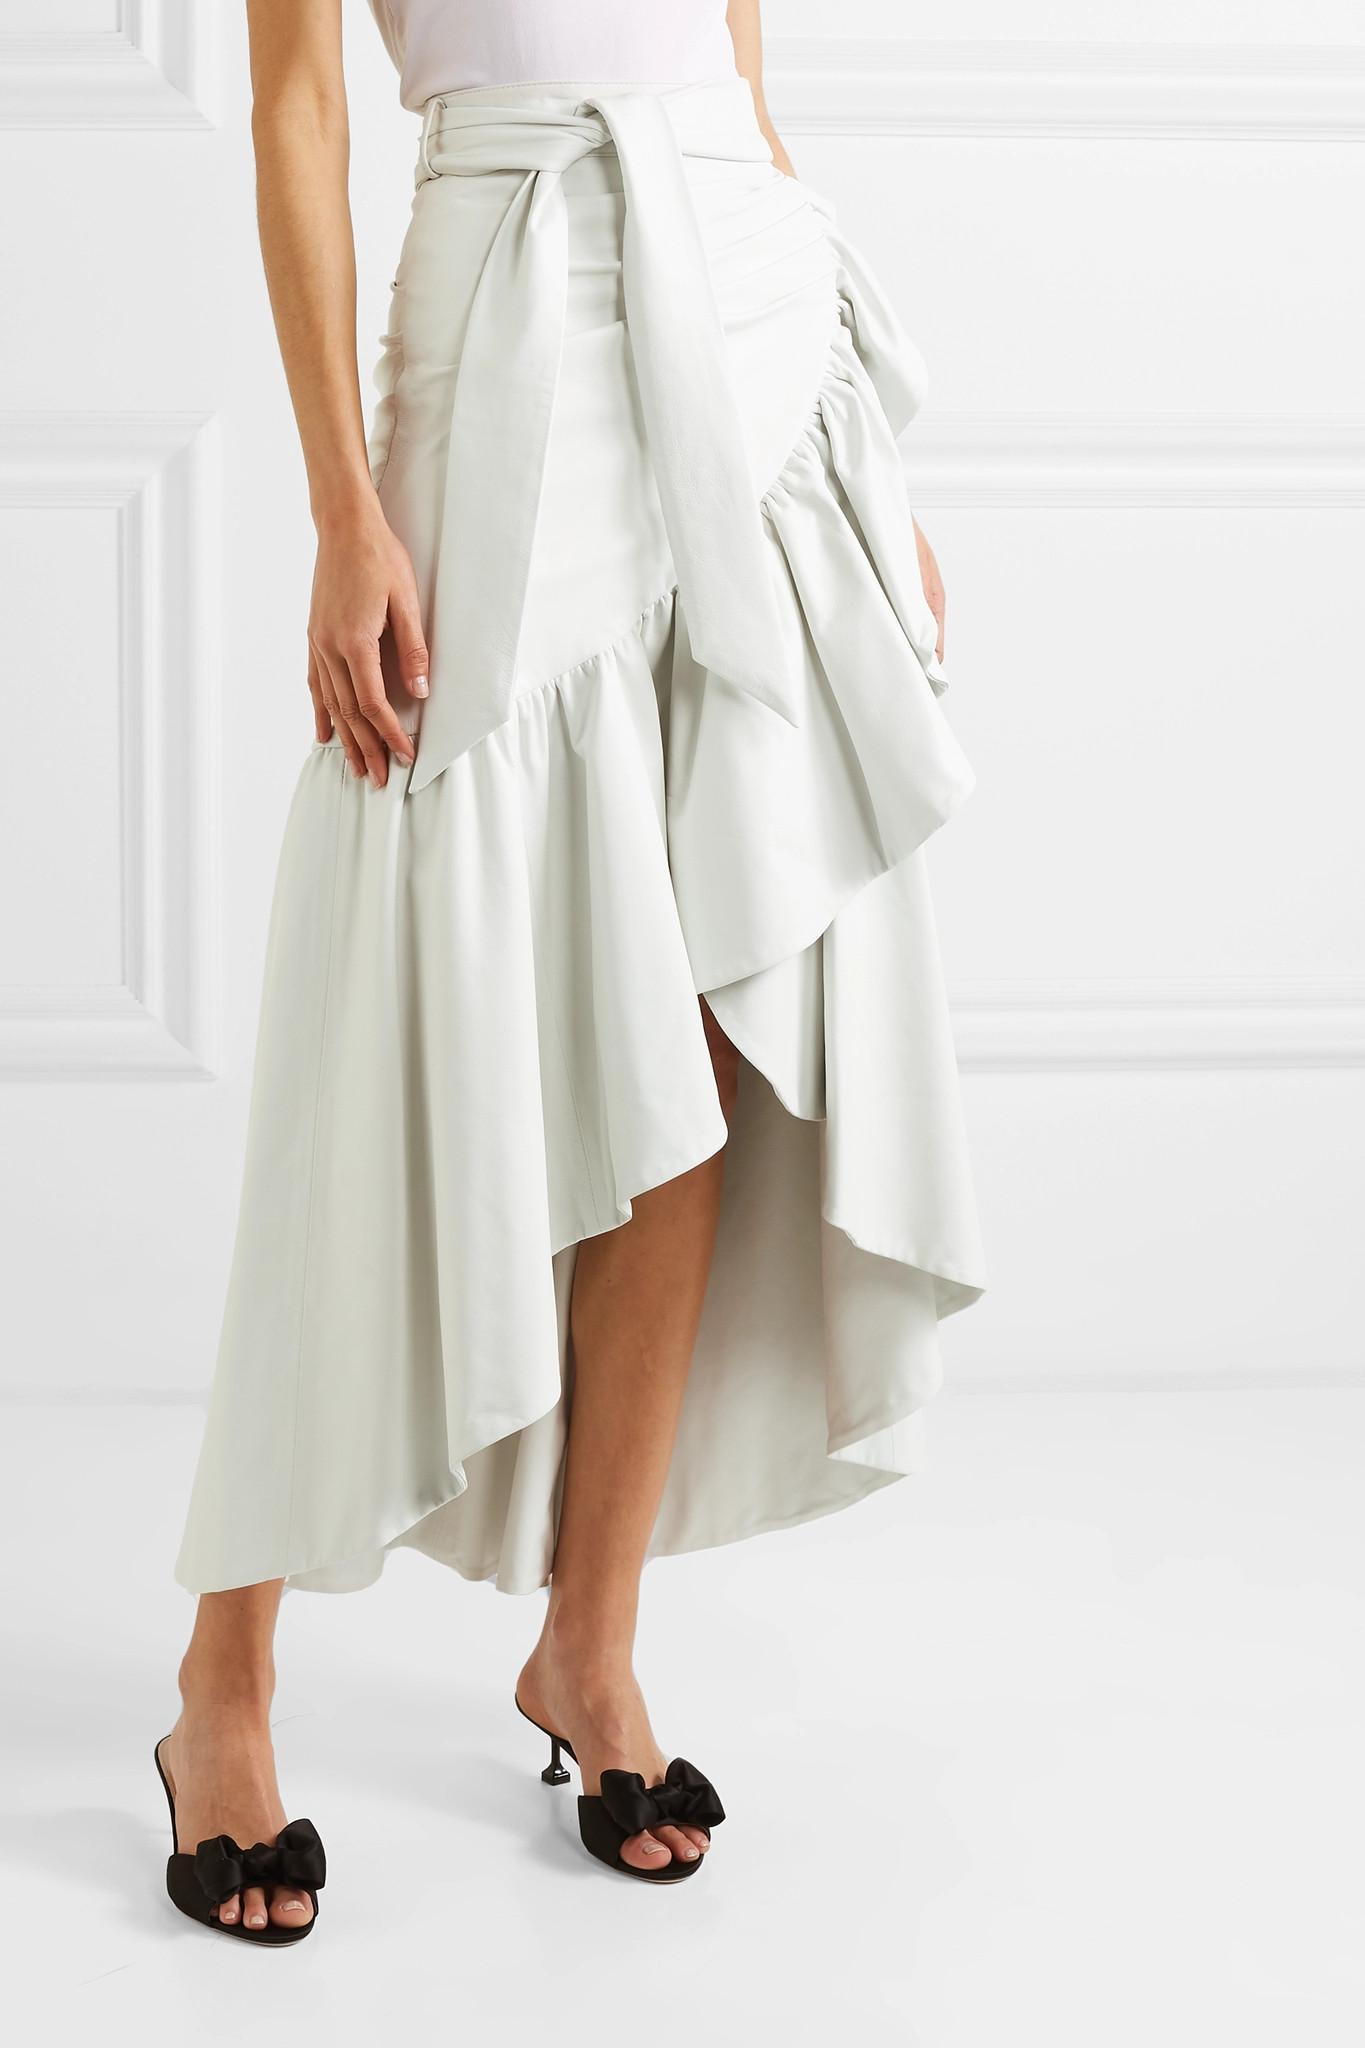 68e4a3fa35 Rodarte - White Ruffled Leather Skirt - Lyst. View fullscreen